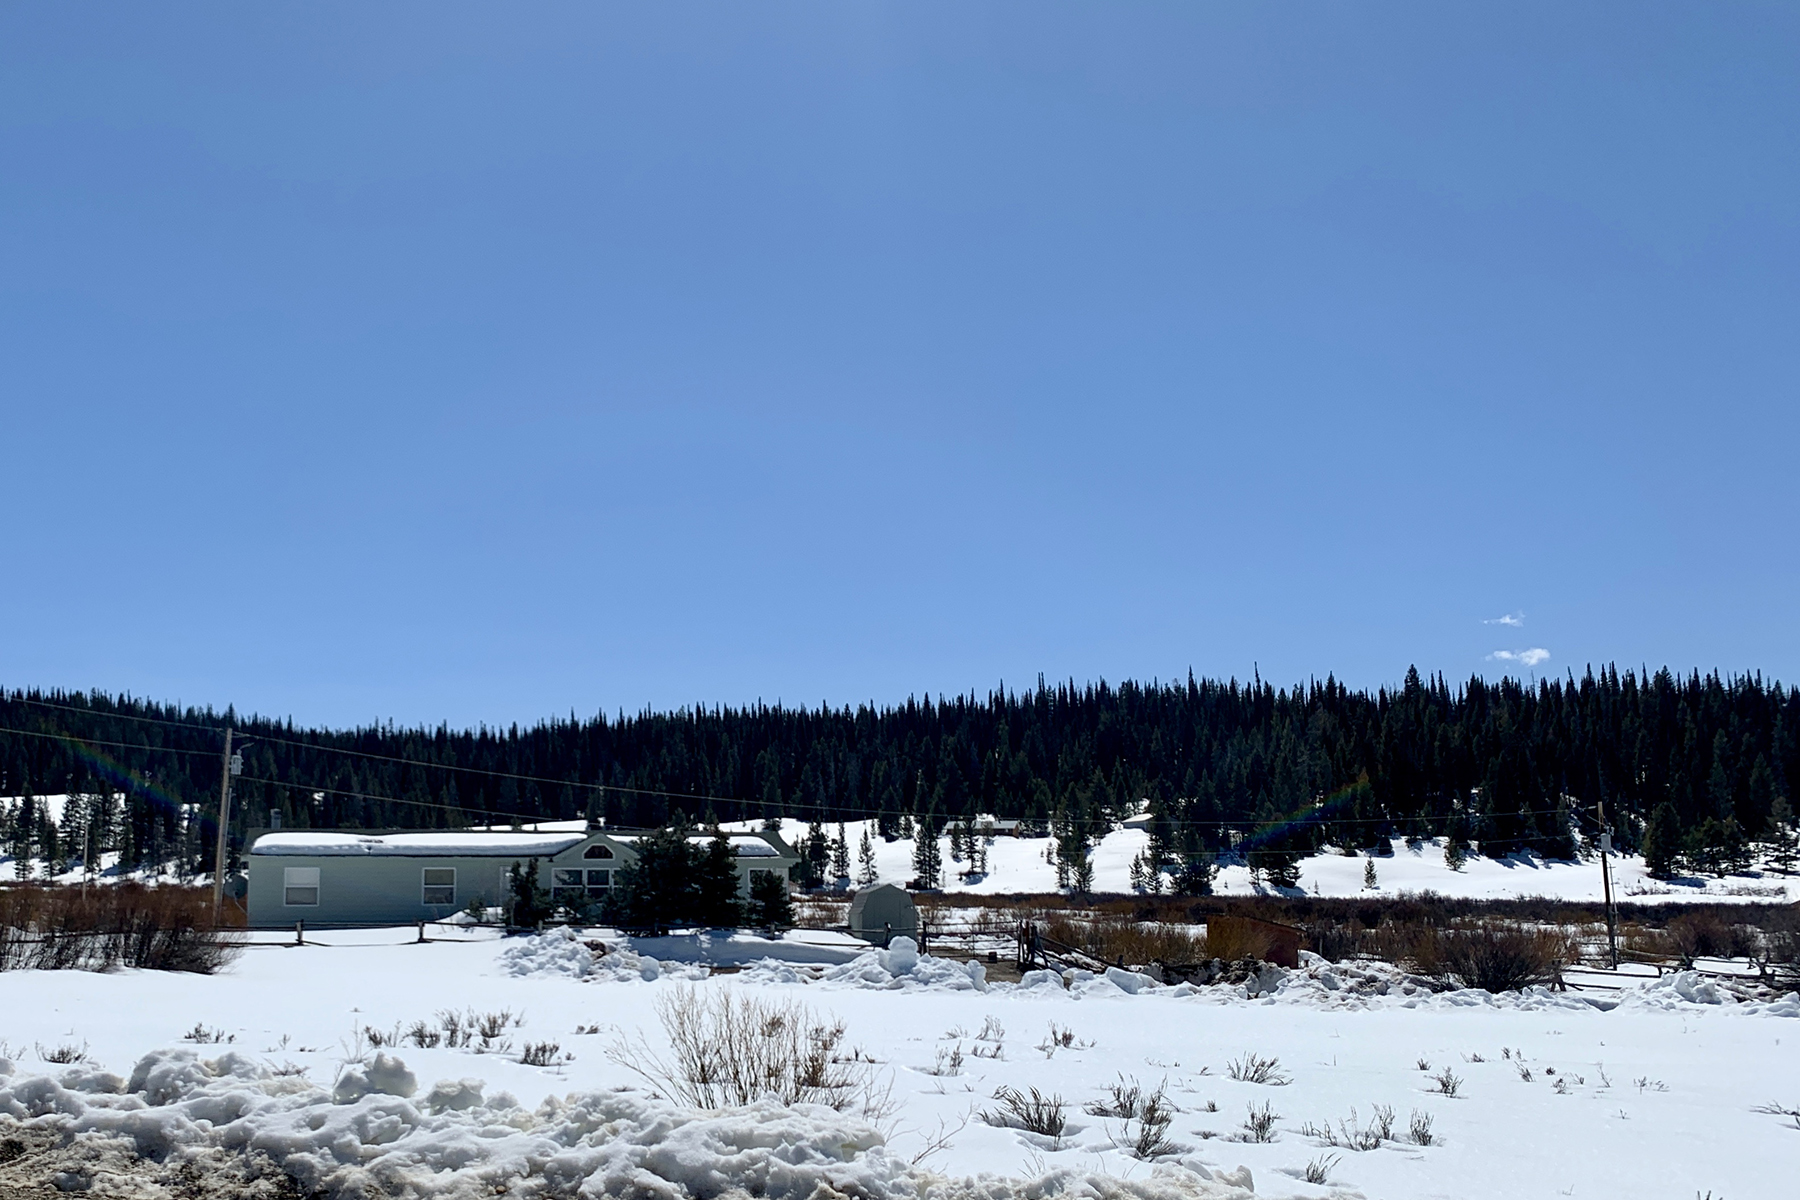 Single Family Homes for Sale at 122 Jack Creek 23-108 Bondurant, Wyoming 82922 United States